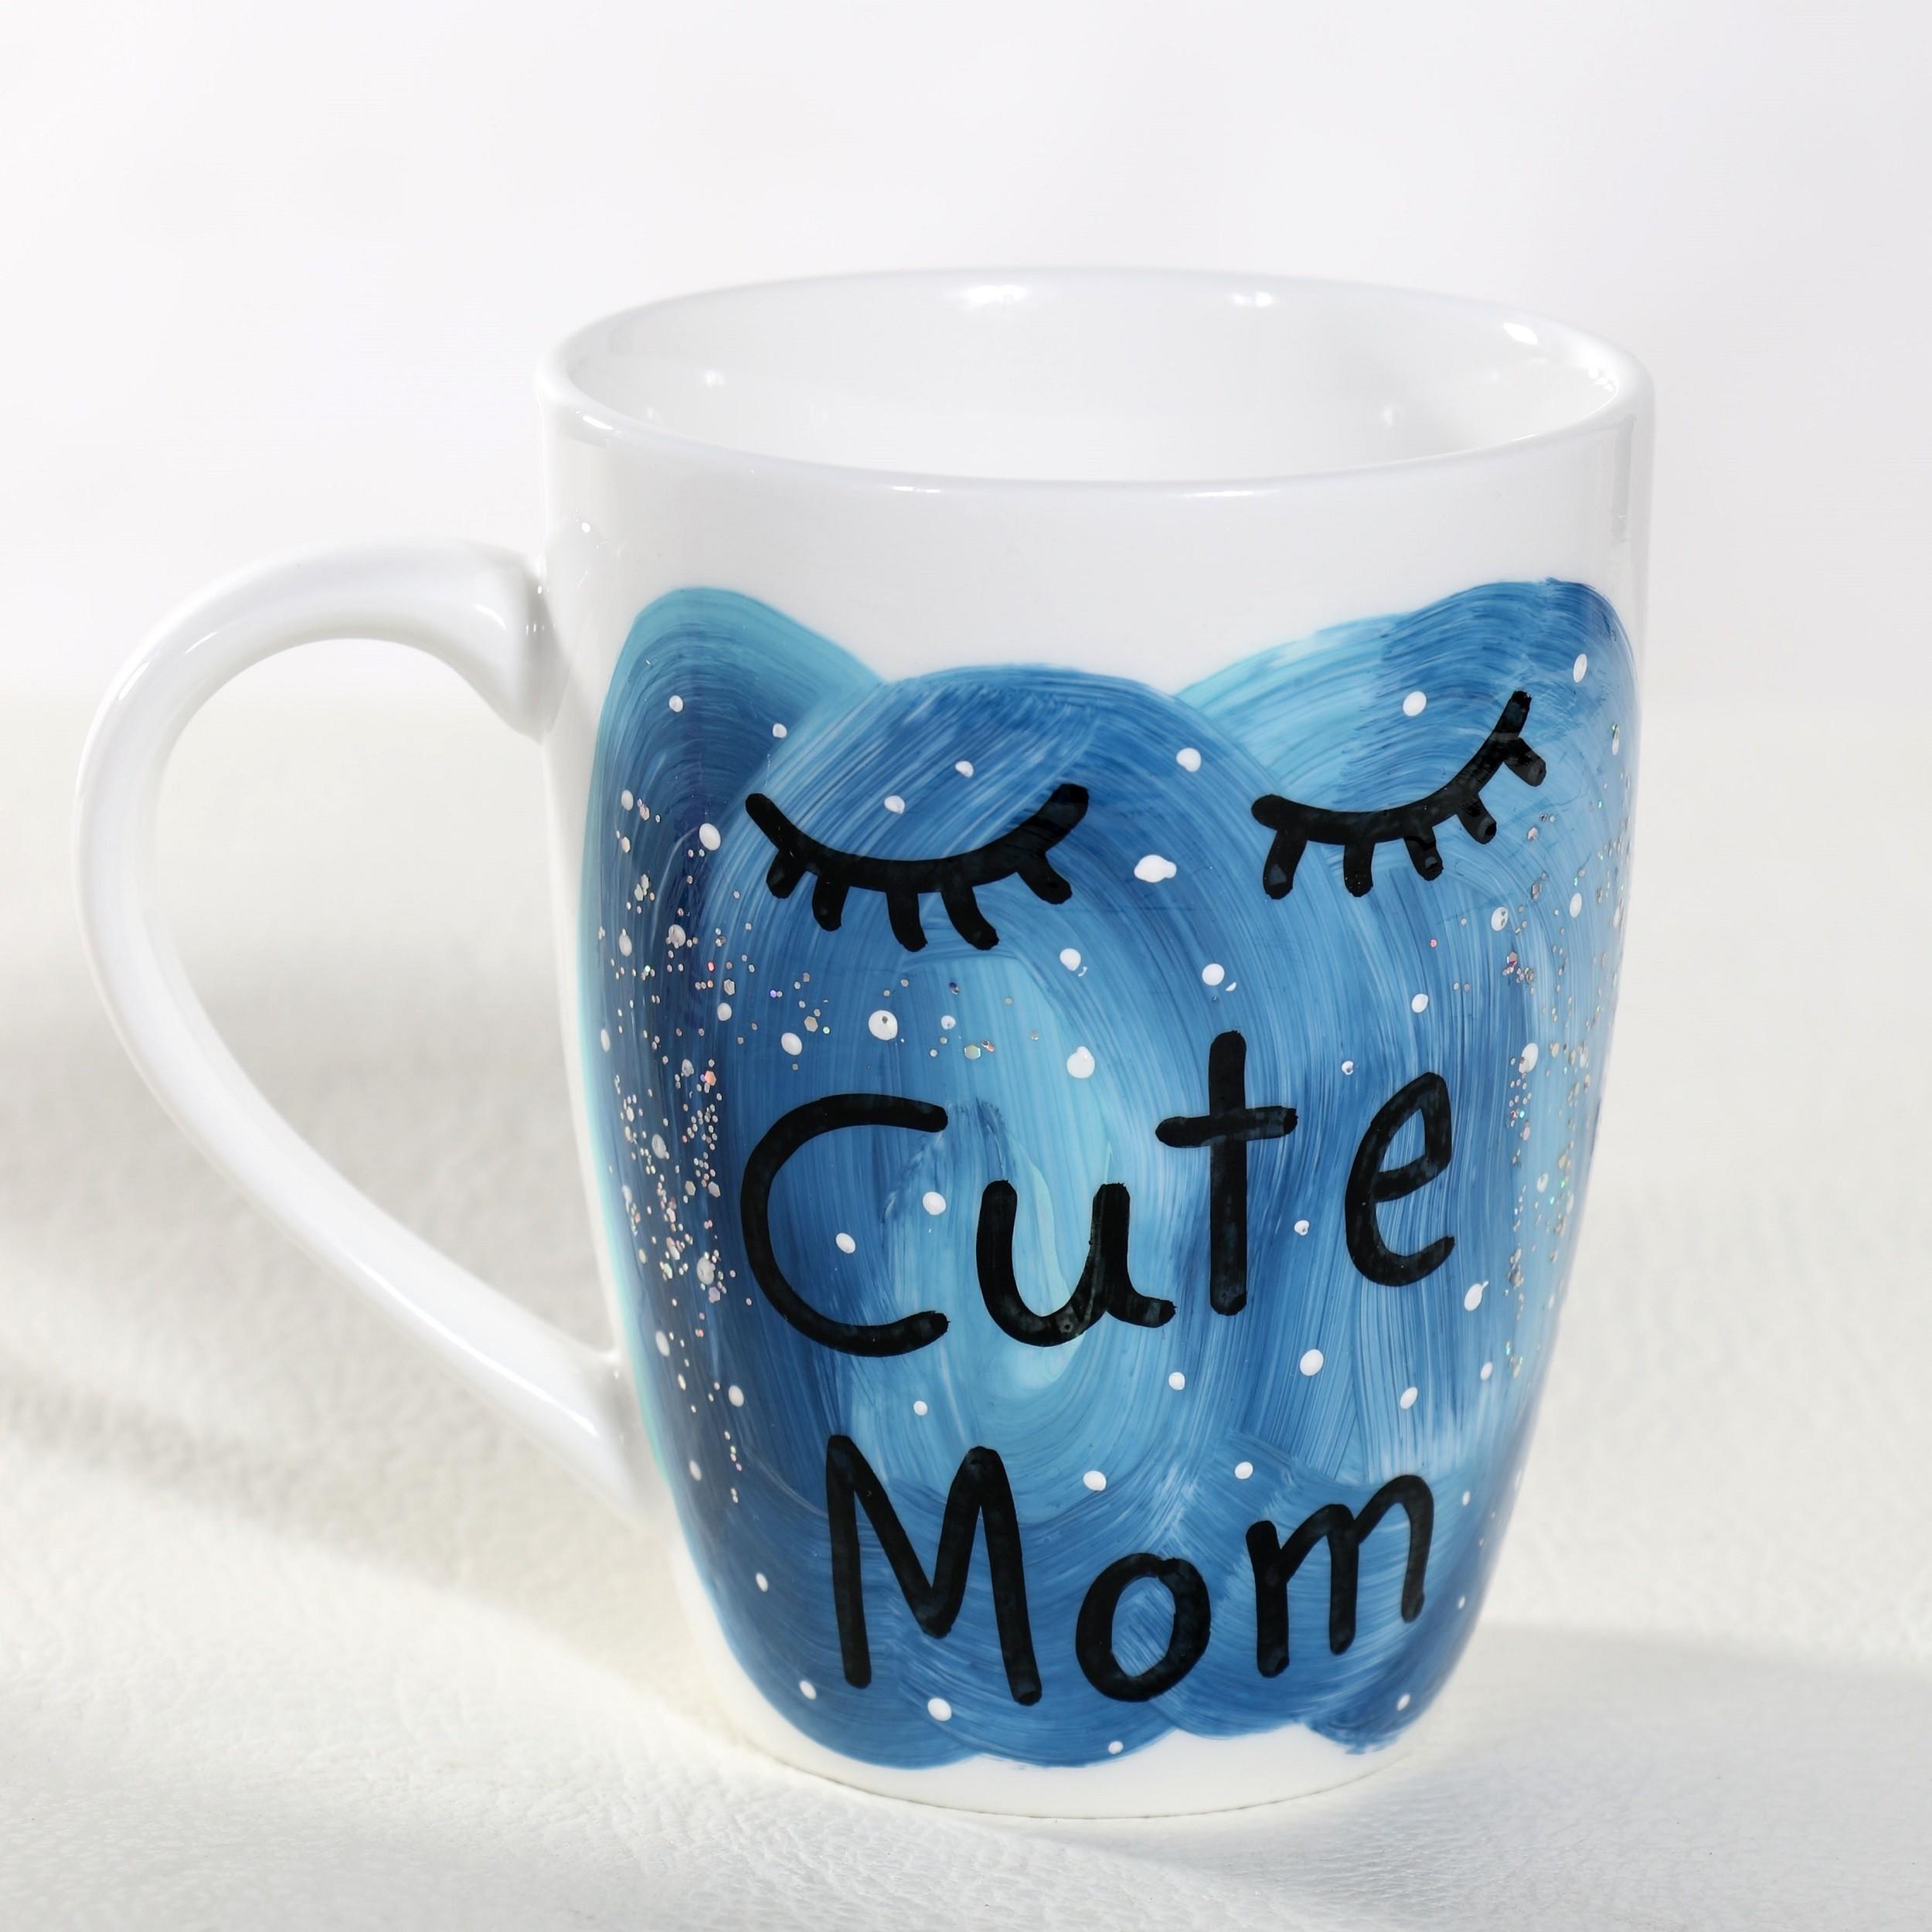 Cute Mom Hand Painted Mug